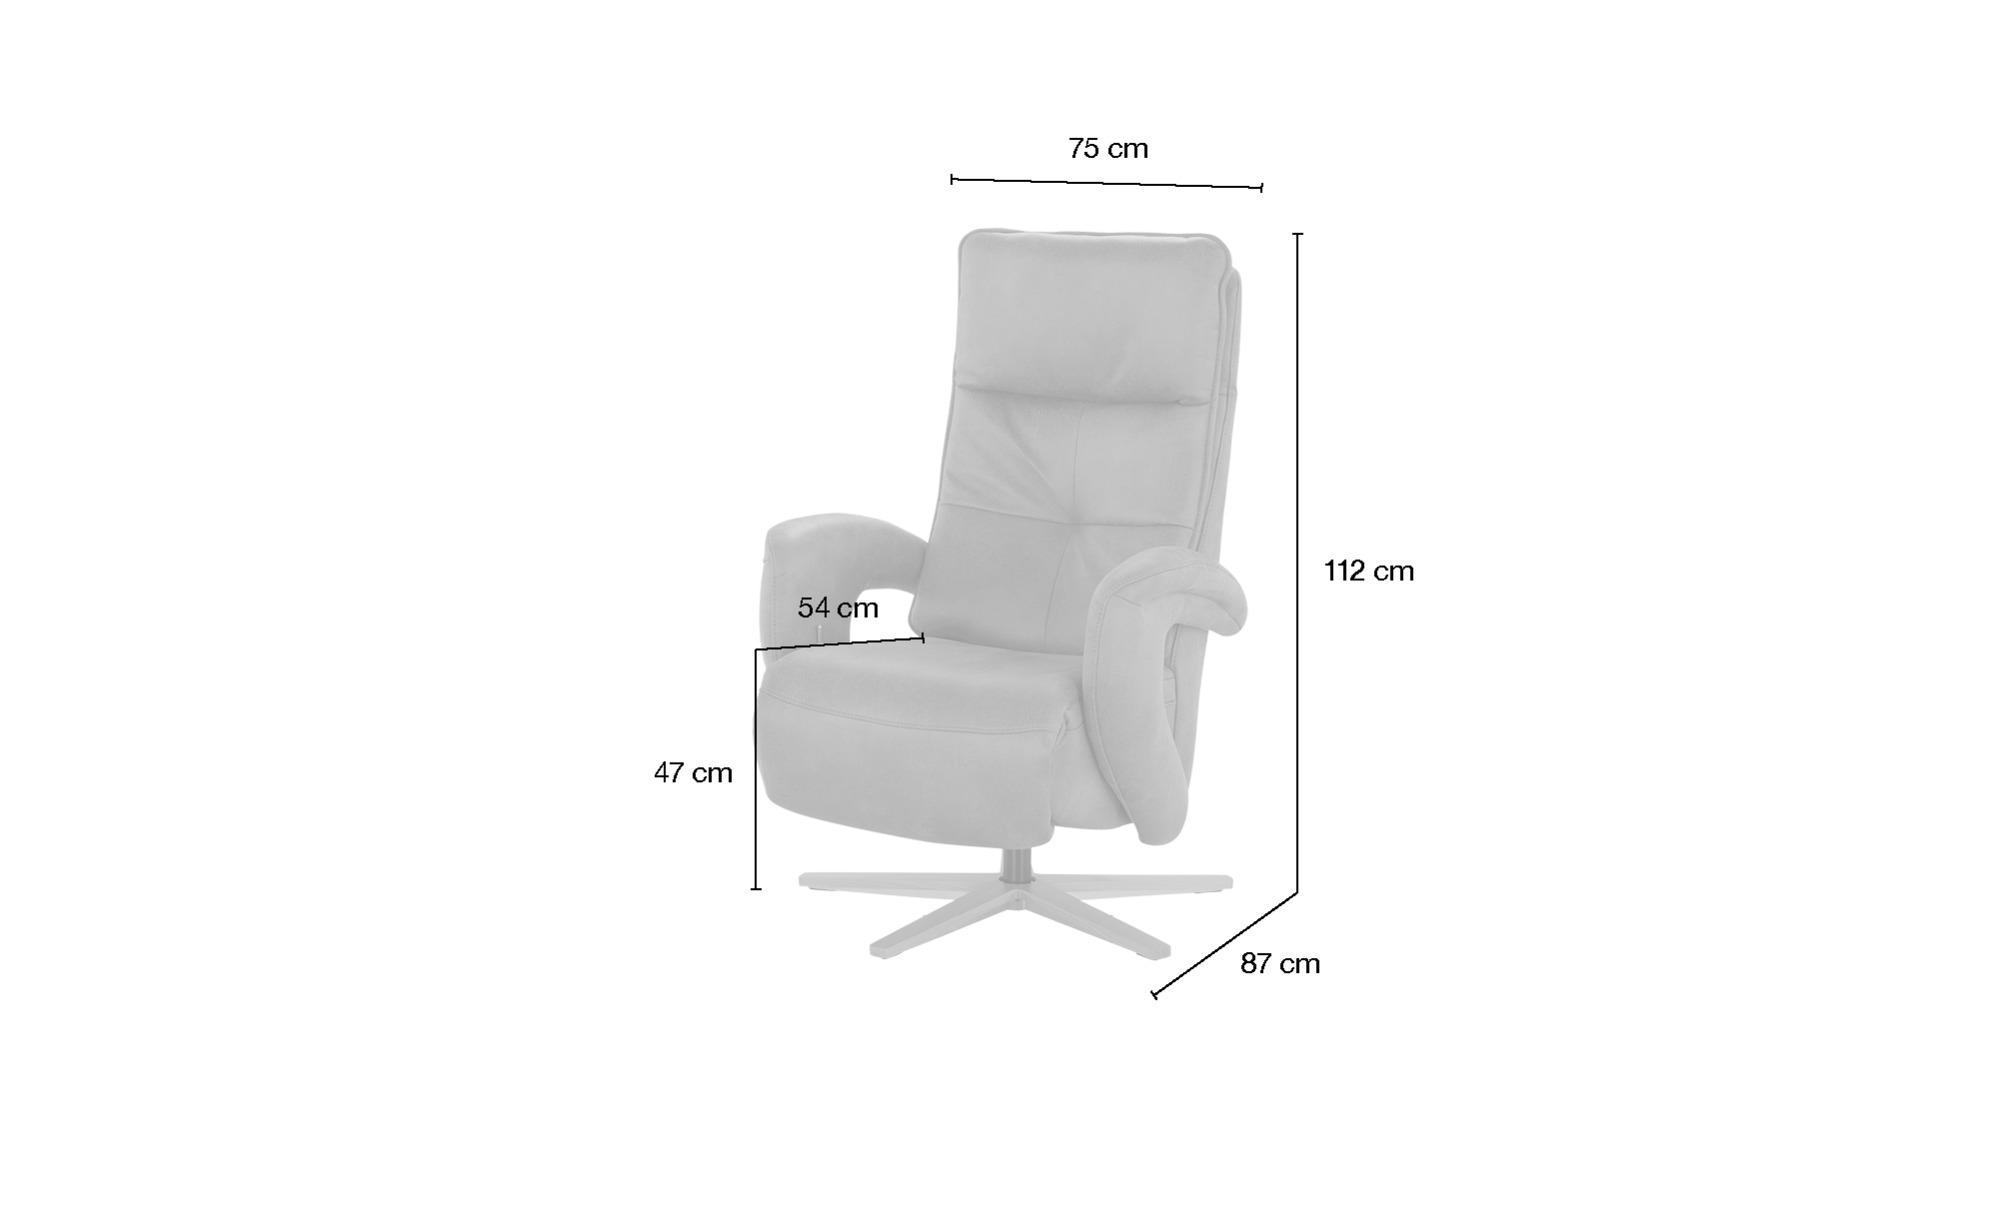 Relaxsessel  Edvin ¦ braun ¦ Maße (cm): B: 75 H: 112 T: 87 Polstermöbel > Sessel > Ledersessel - Höffner